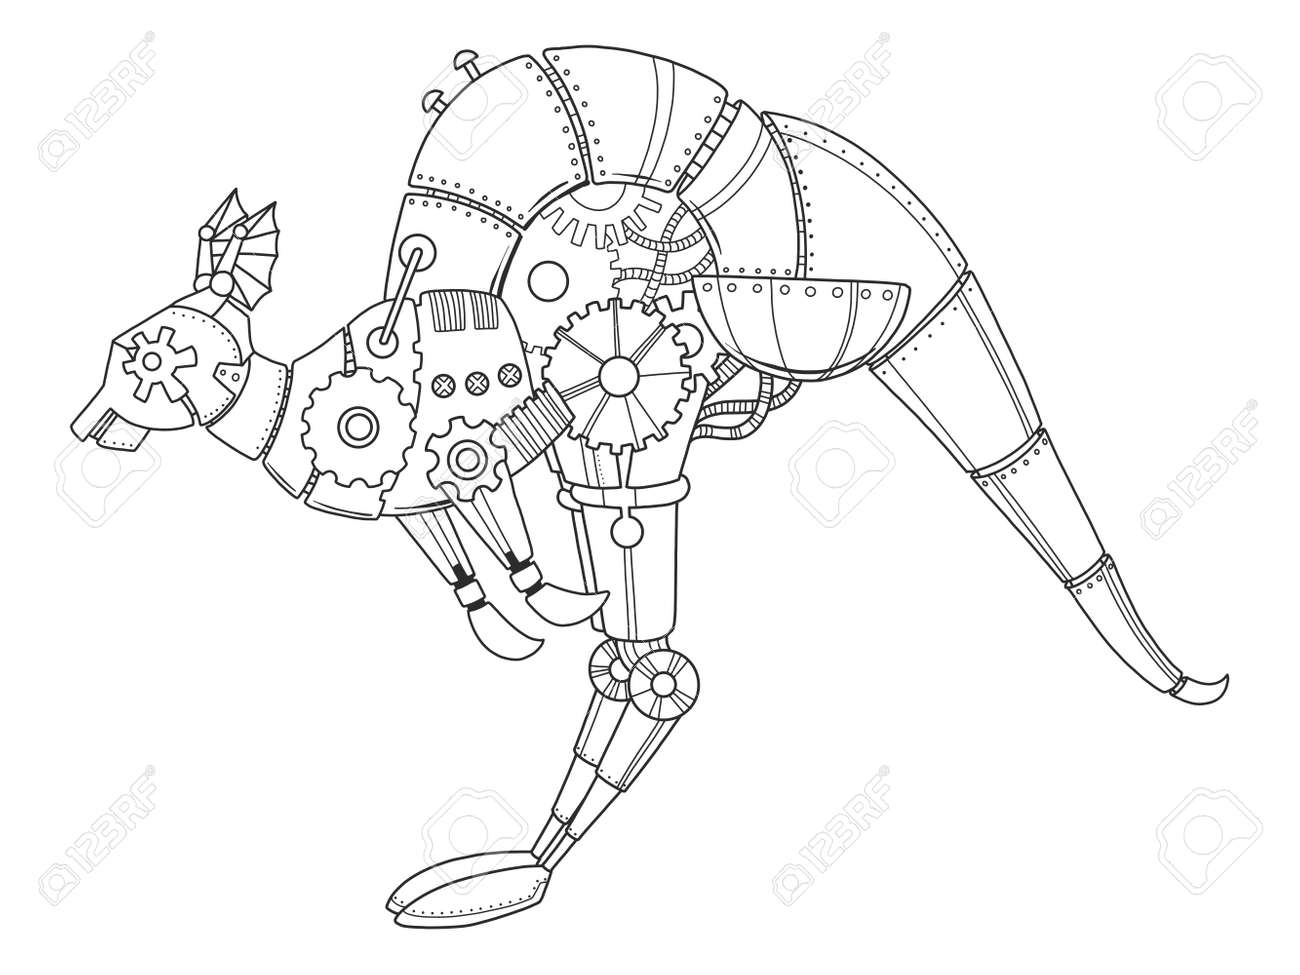 Canguro Estilo Steampunk Animal Mecánico Ilustración De Vector De ...